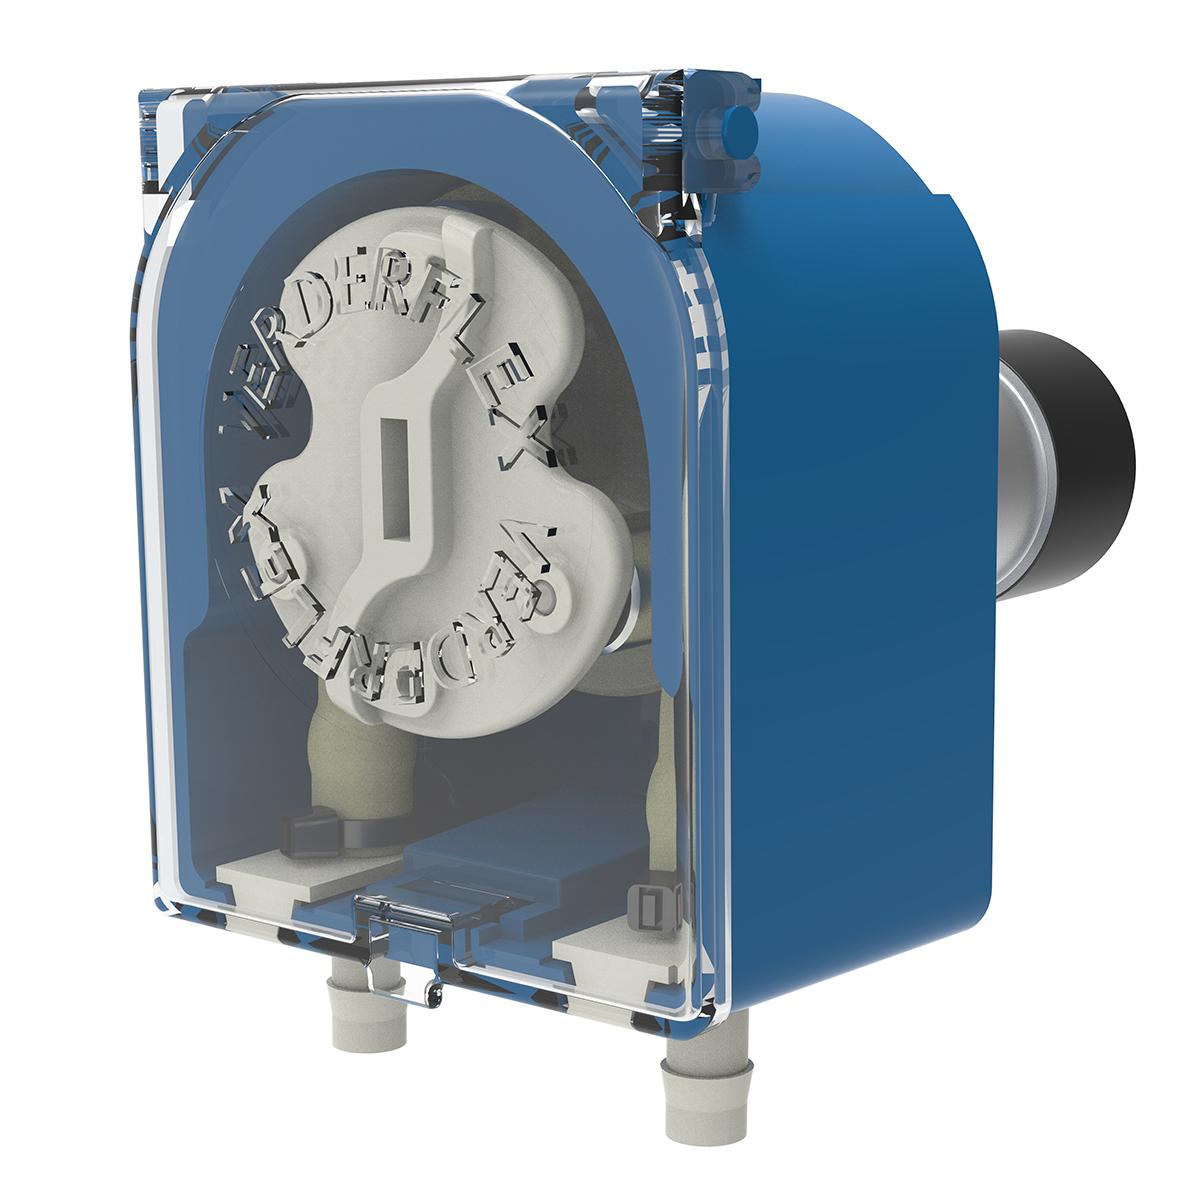 OEM-Schlauchpumpe M025, 12V DC, 120 ml/min